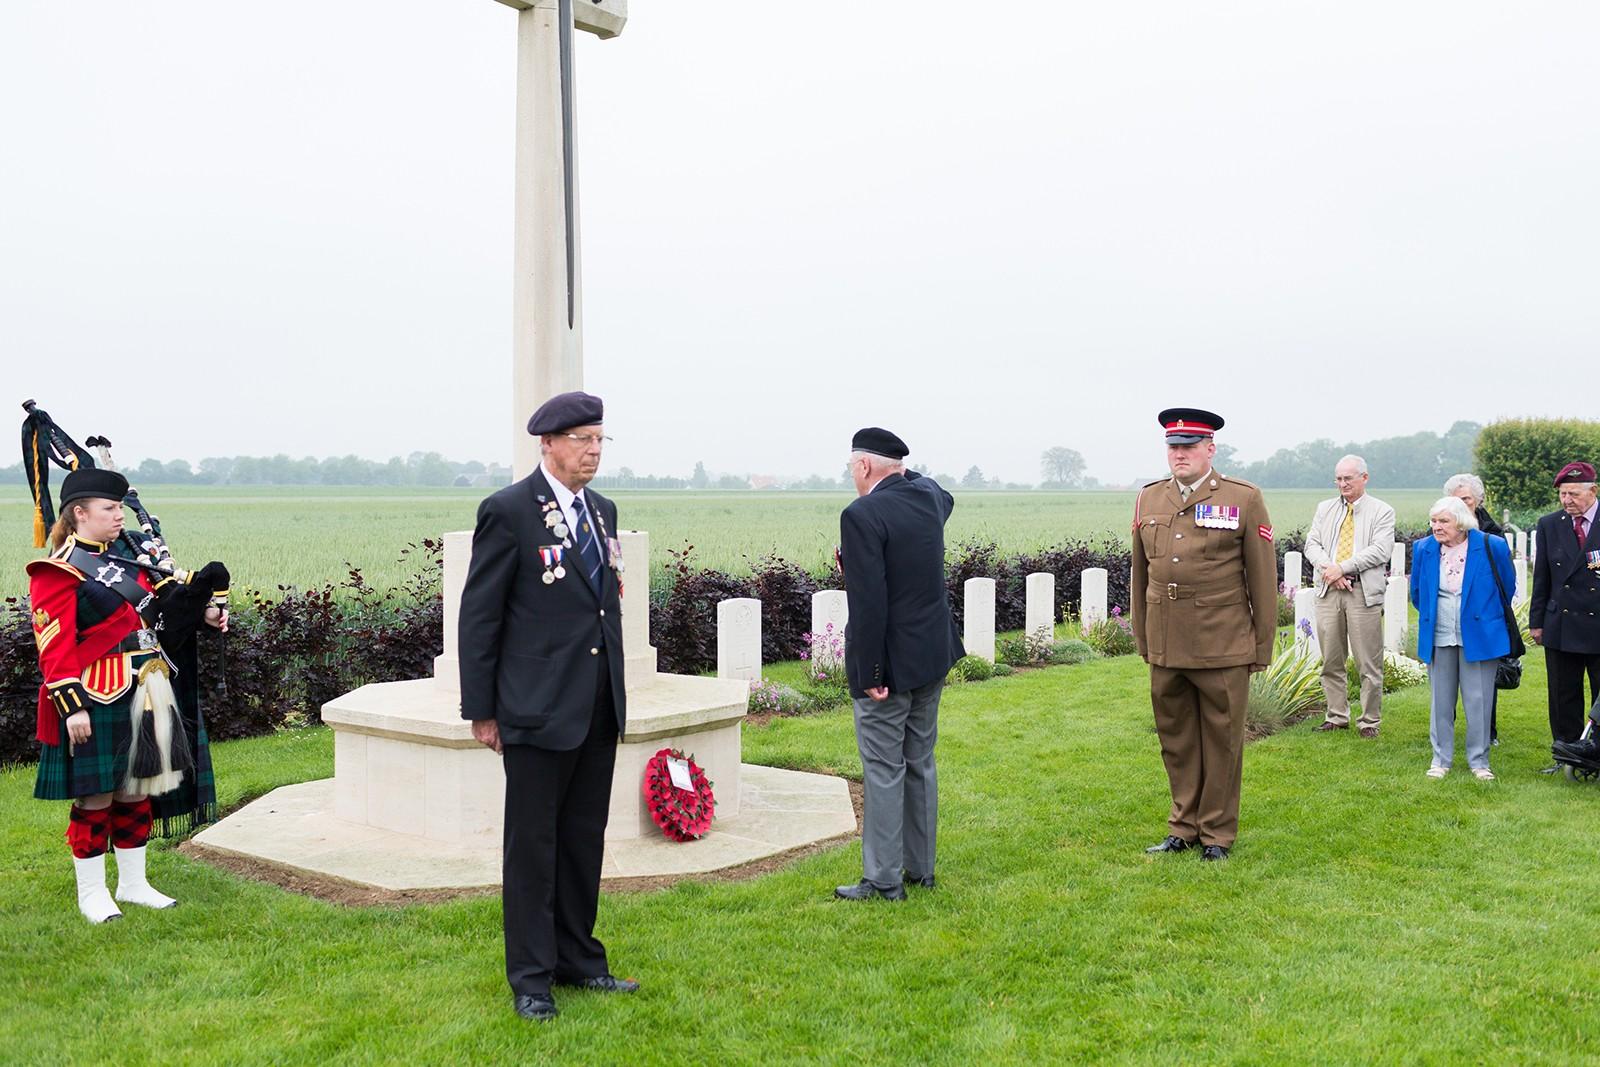 British D-Day Veterans Secqueville Cemetery